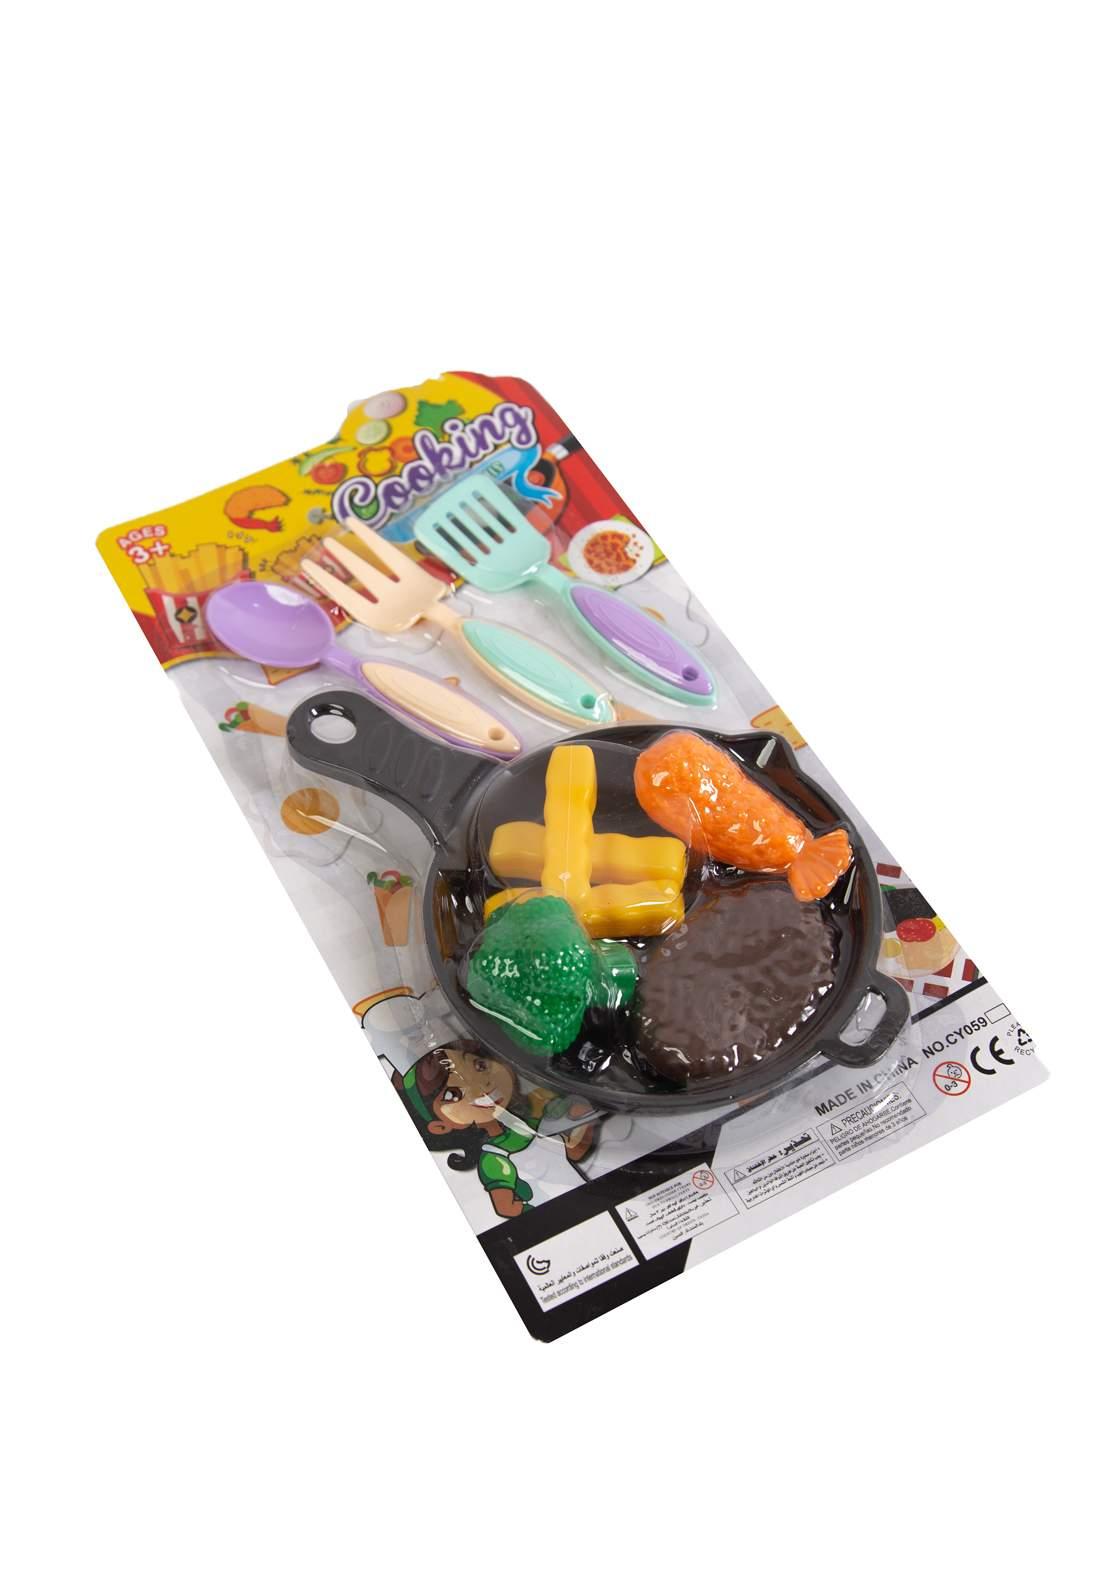 Kitchen Tools For Kids  أدوات طبخ للاطفال